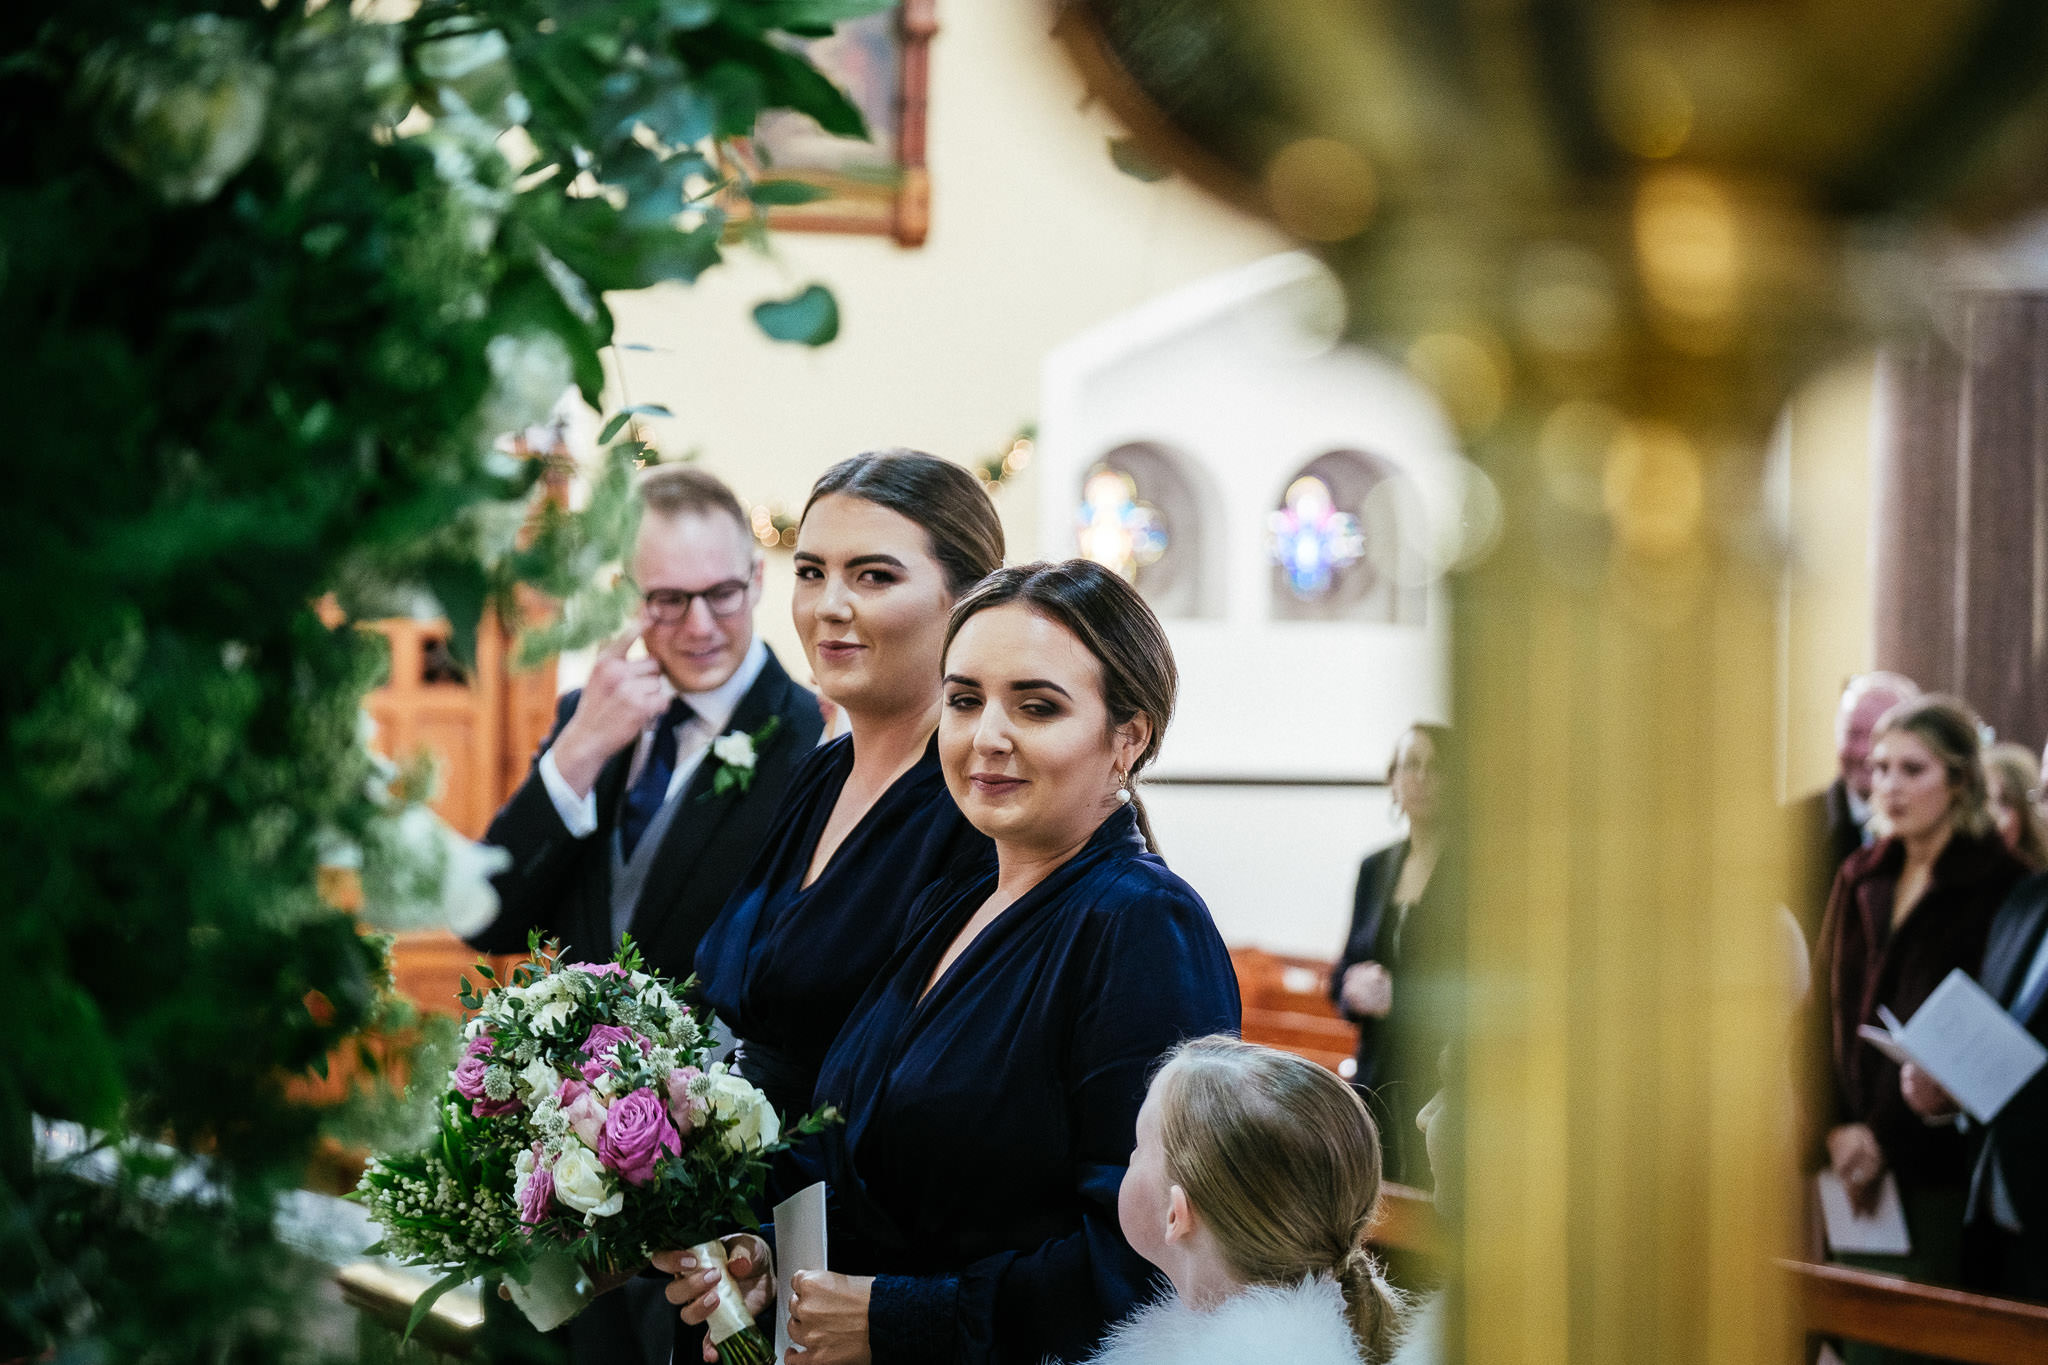 bridesmaid looking at bride during wedding ceremony at St Brigid's Church Oldcastle